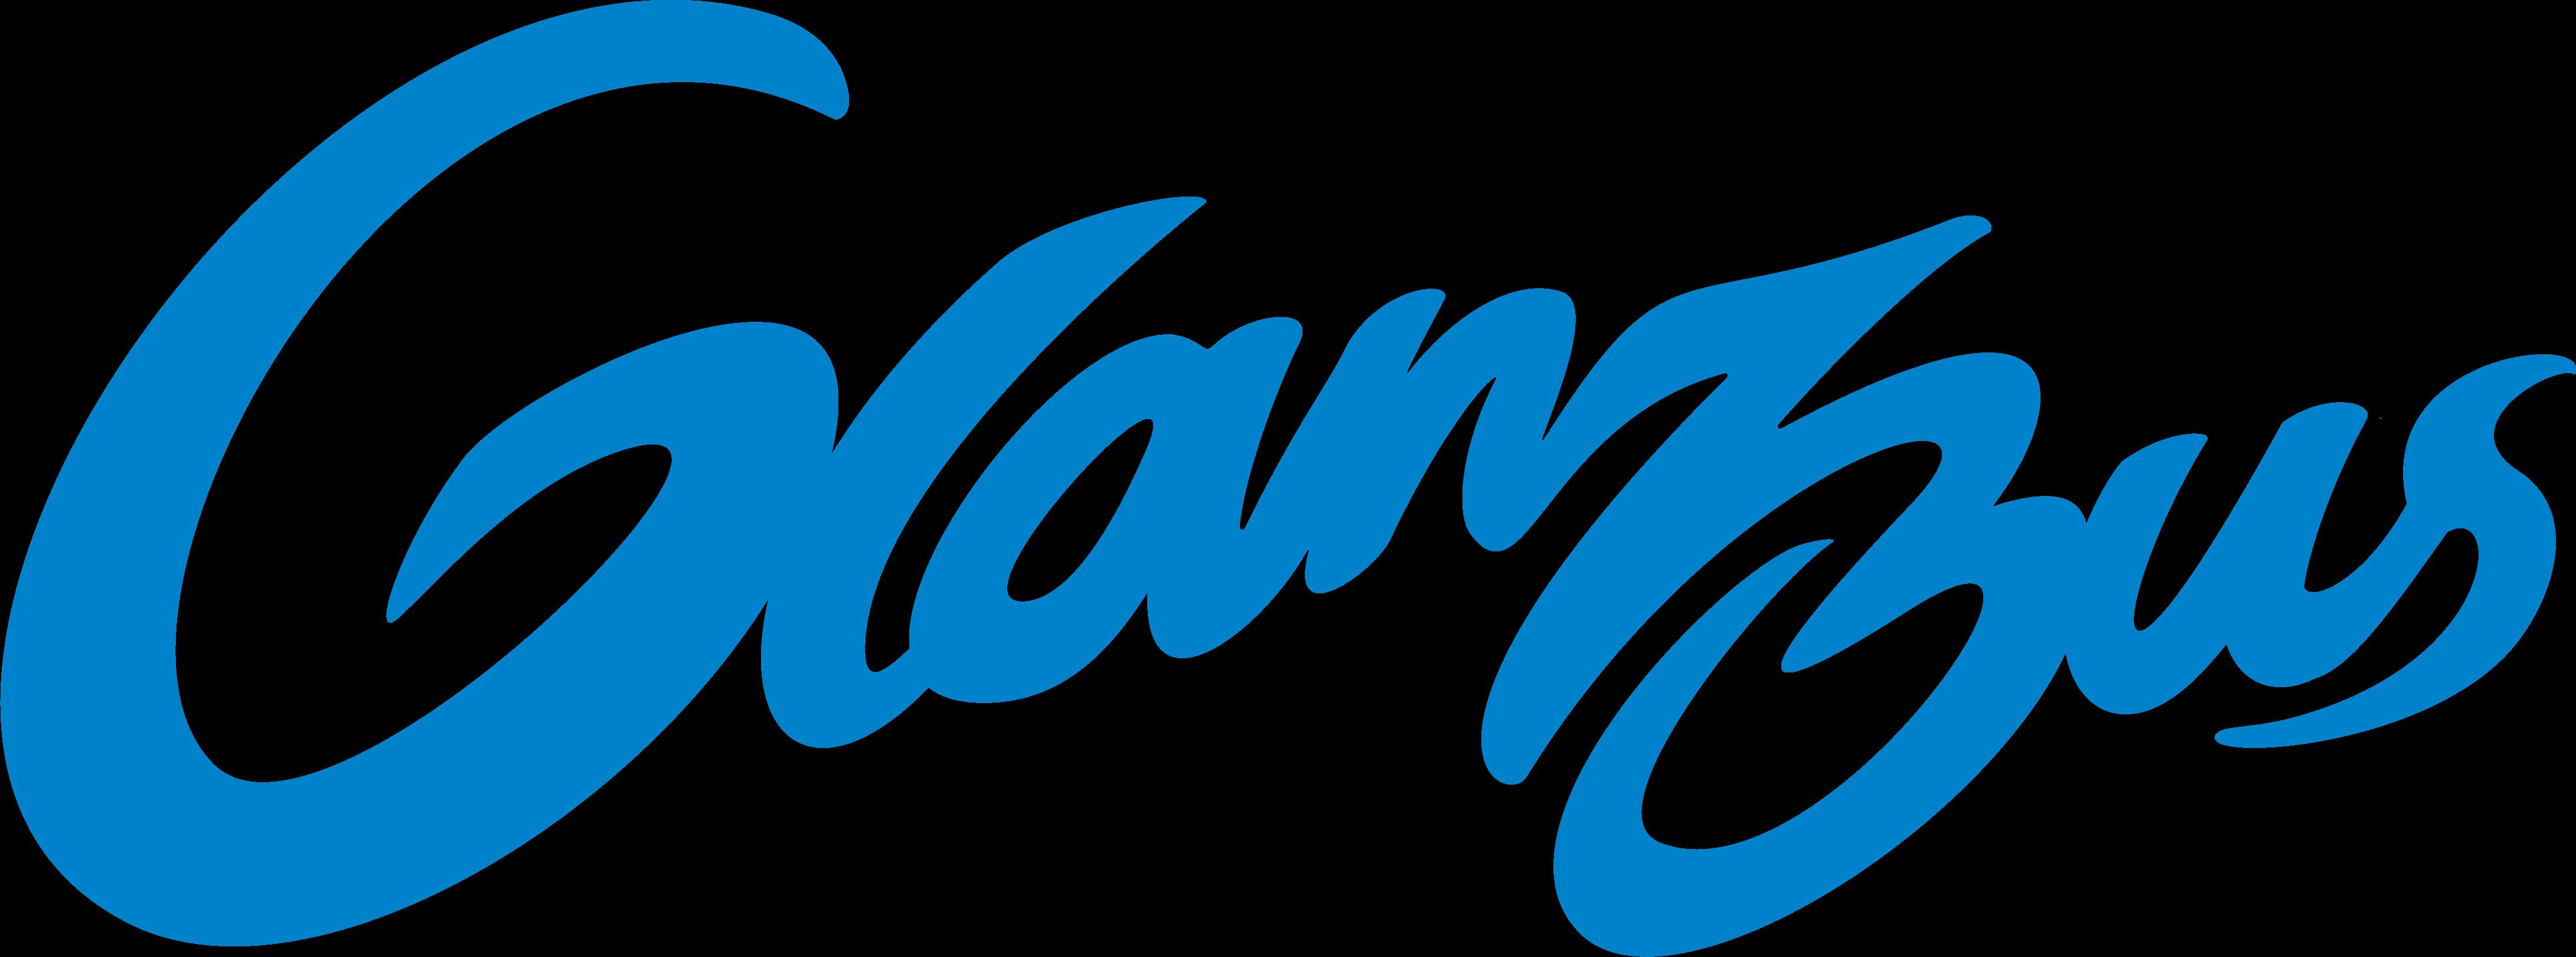 Glanzbus – Detailing Fahrzeugaufbereitung